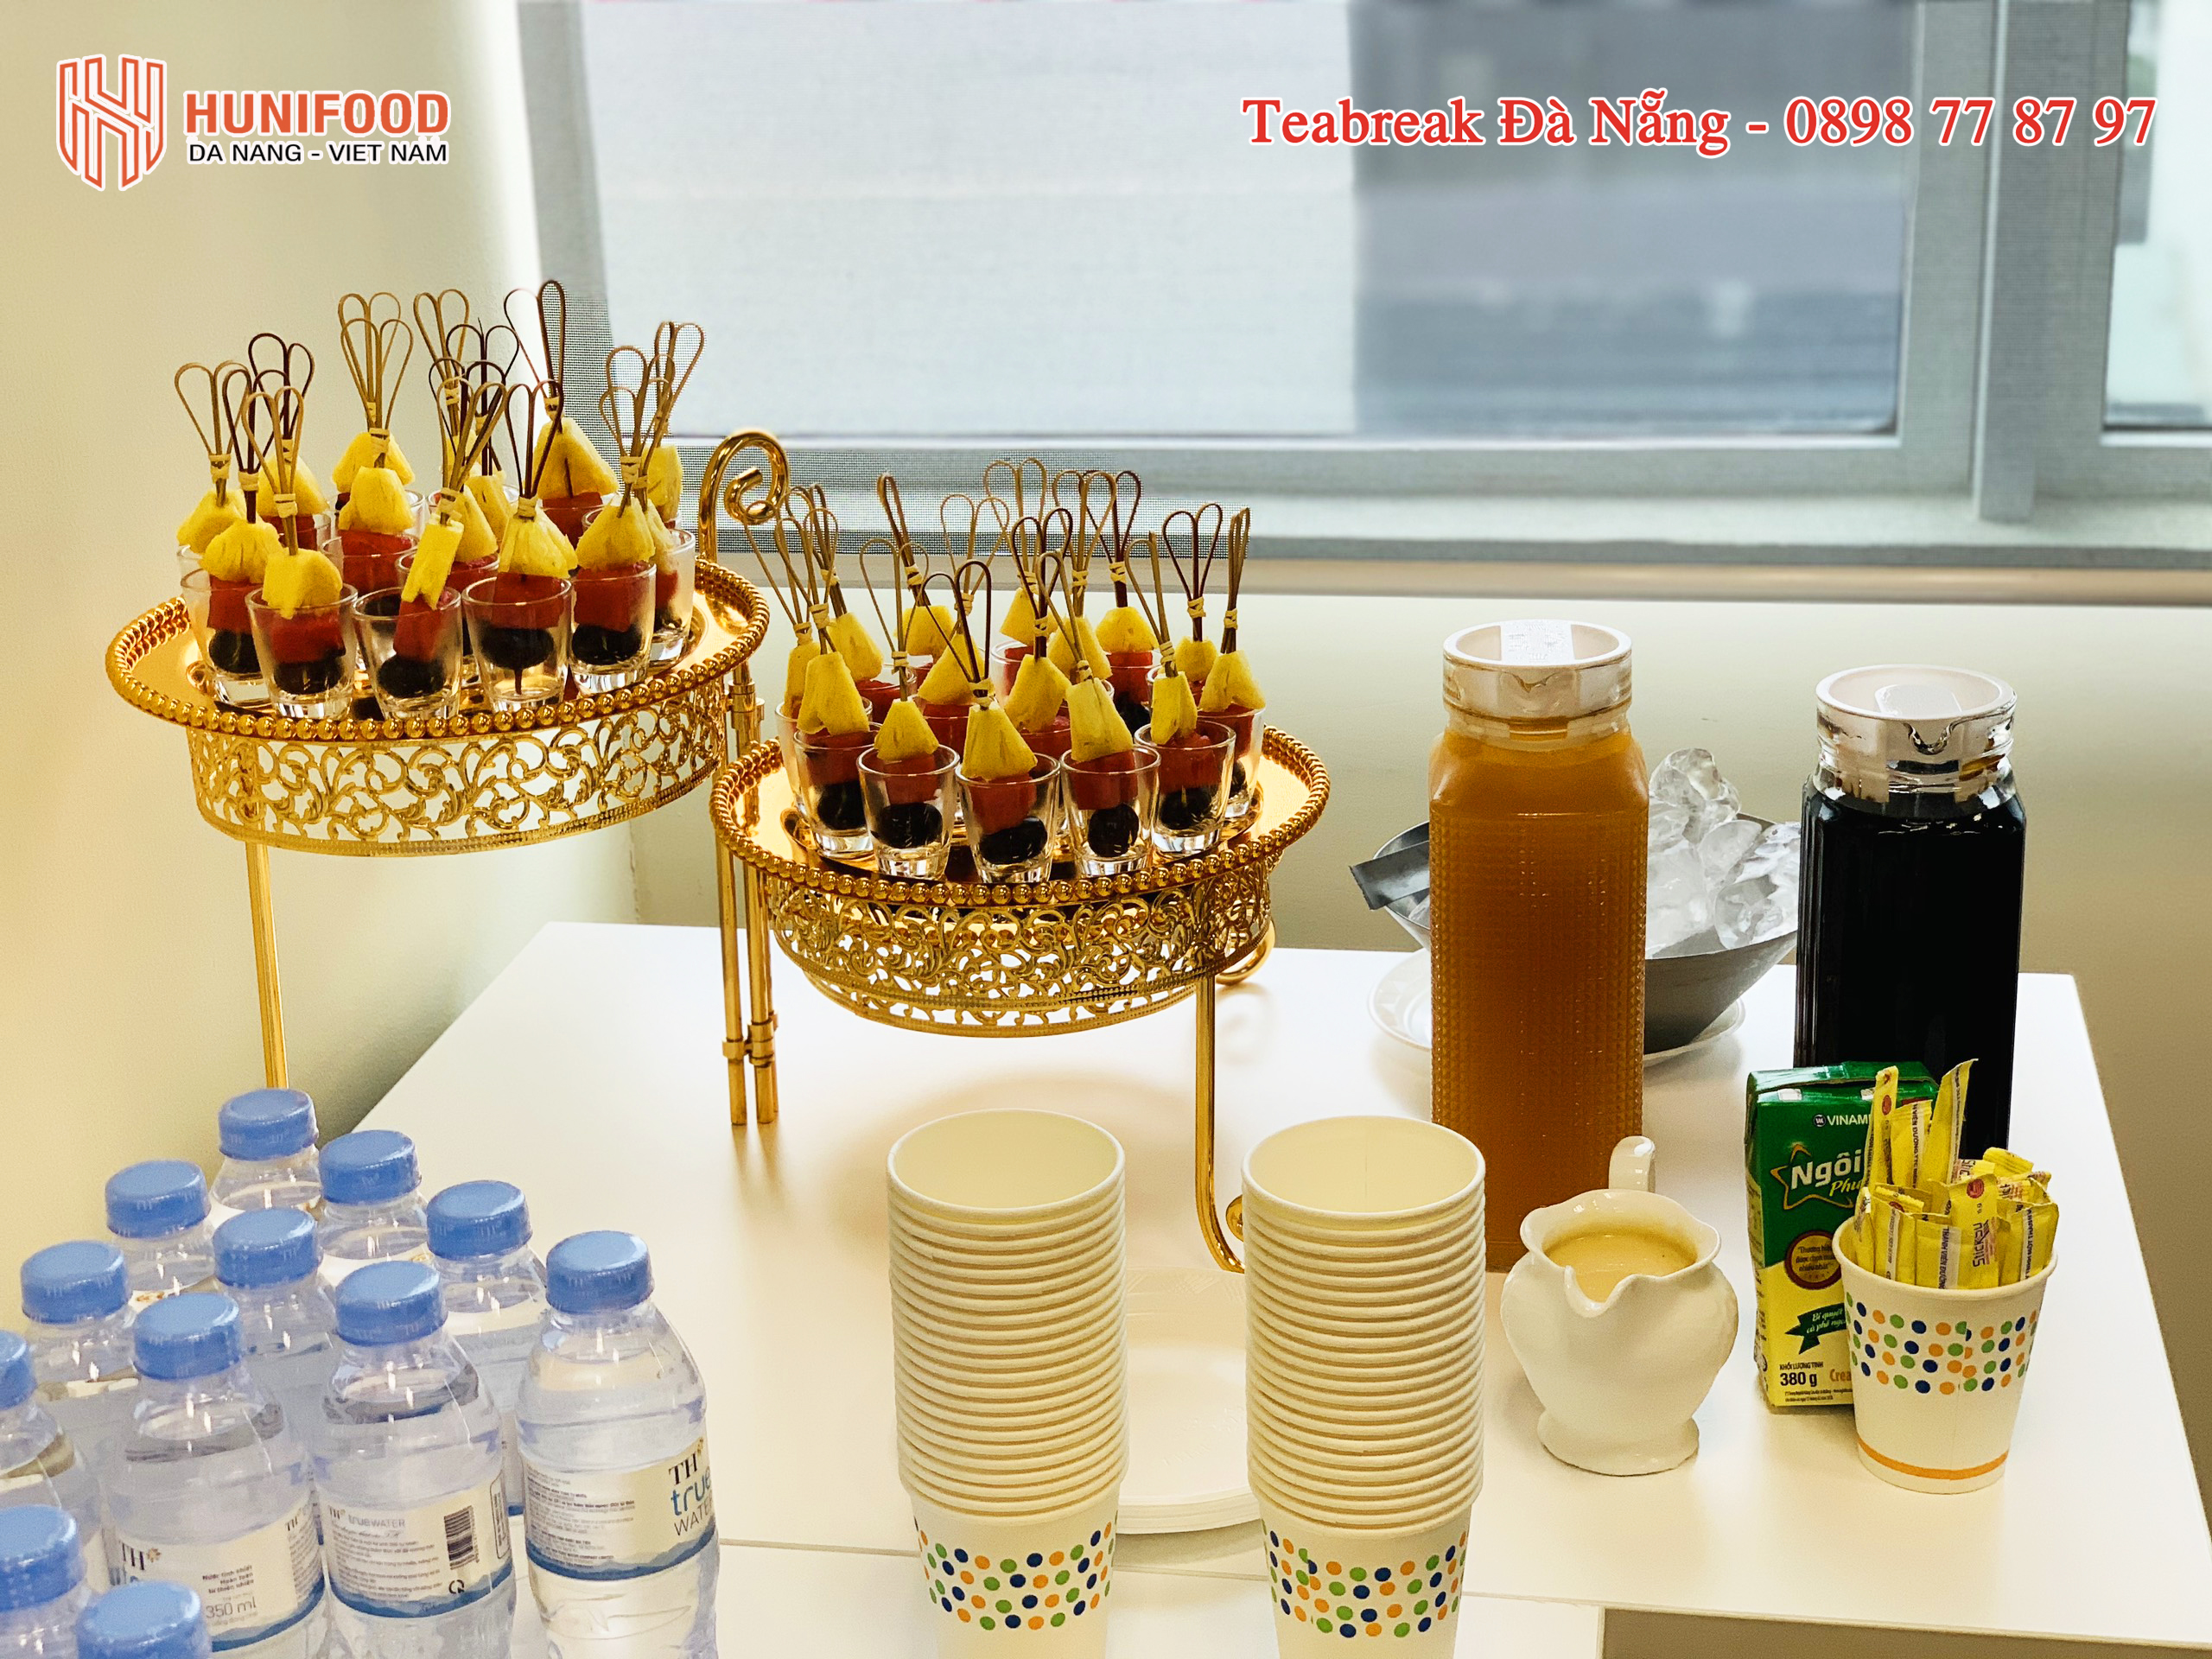 teabreak buổi họp